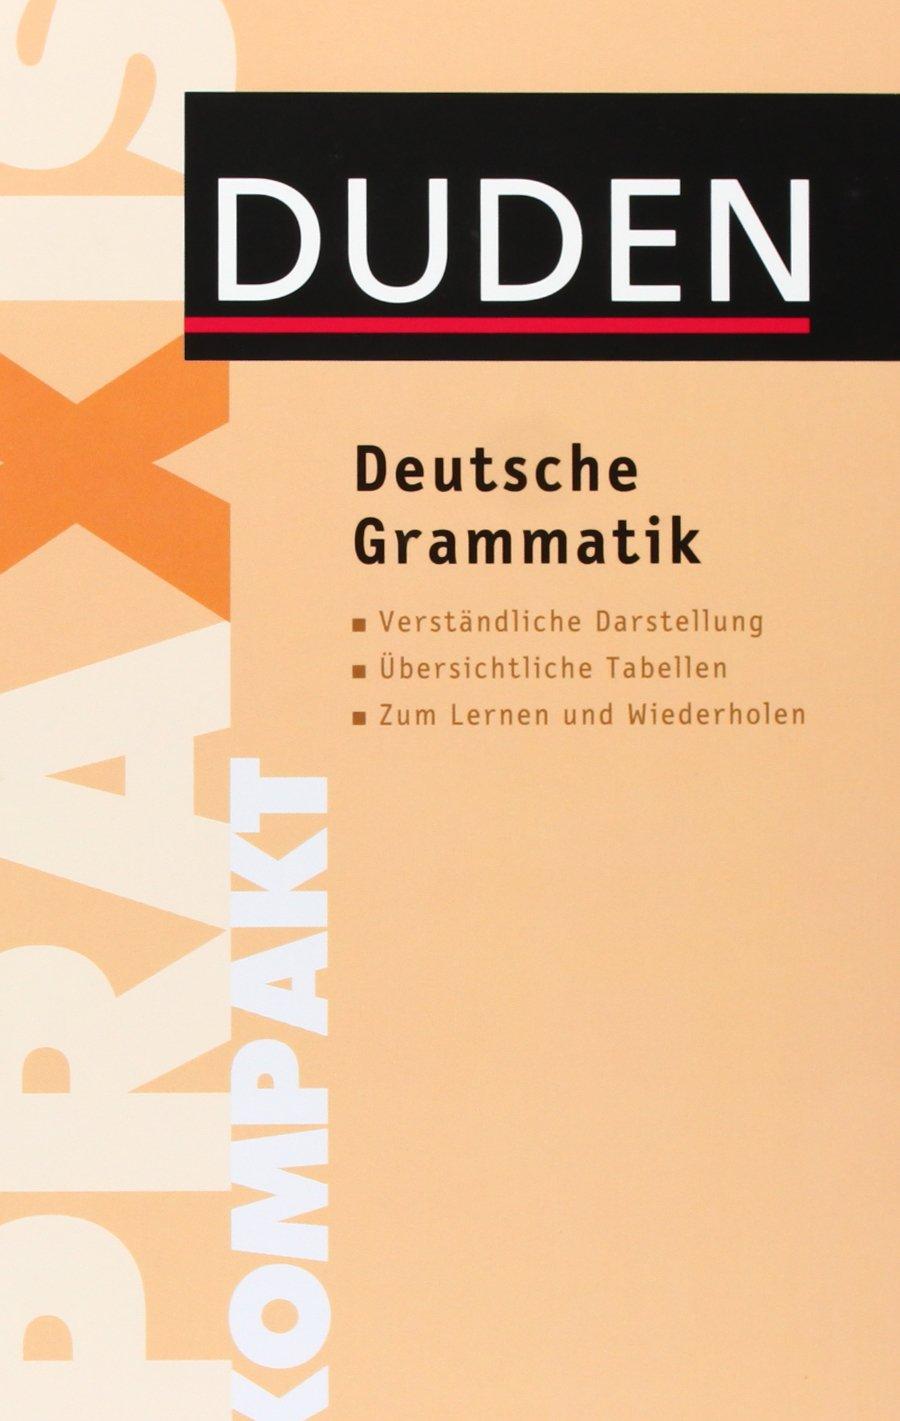 Duden, Praxis kompakt, Deutsch Grammatik